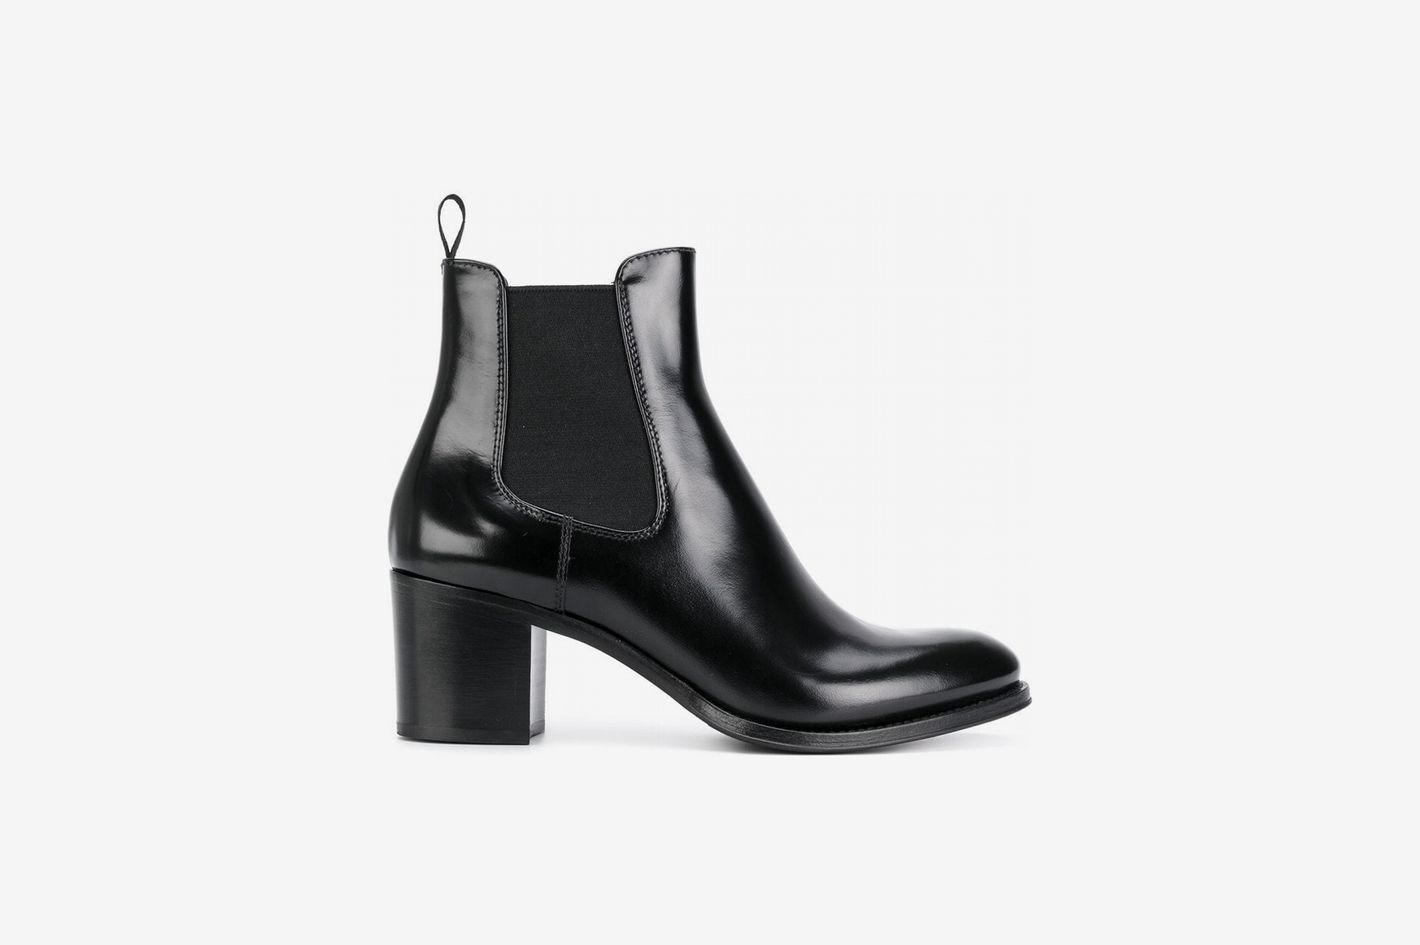 75a85c91d0eb Church s Chunky Heel Chelsea Boots